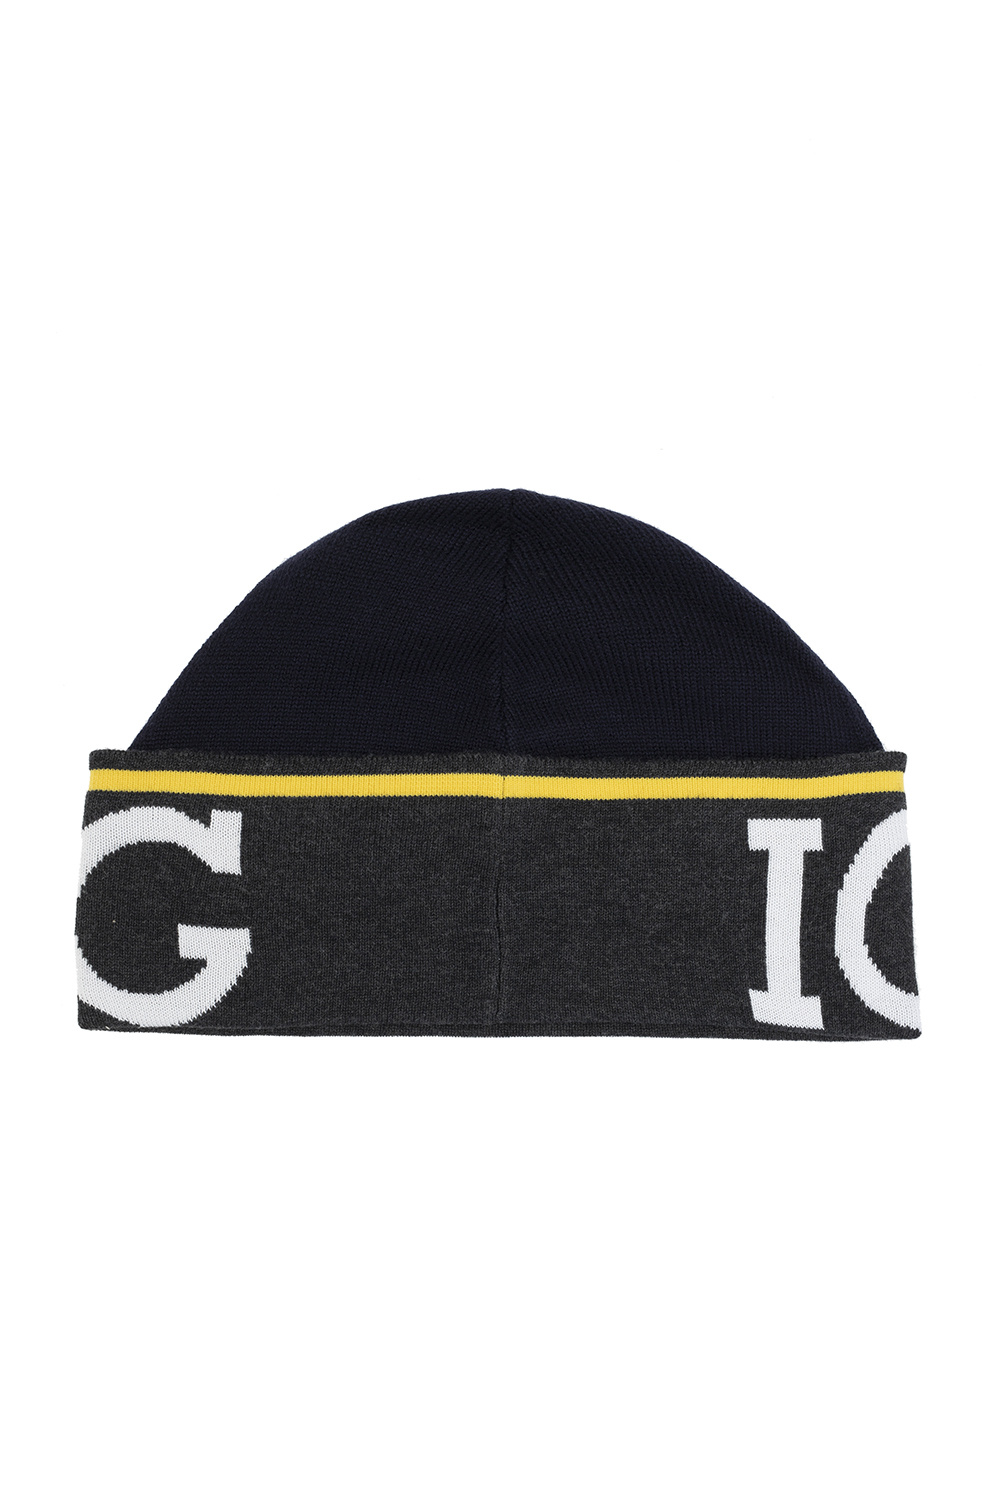 Iceberg Wool hat with logo